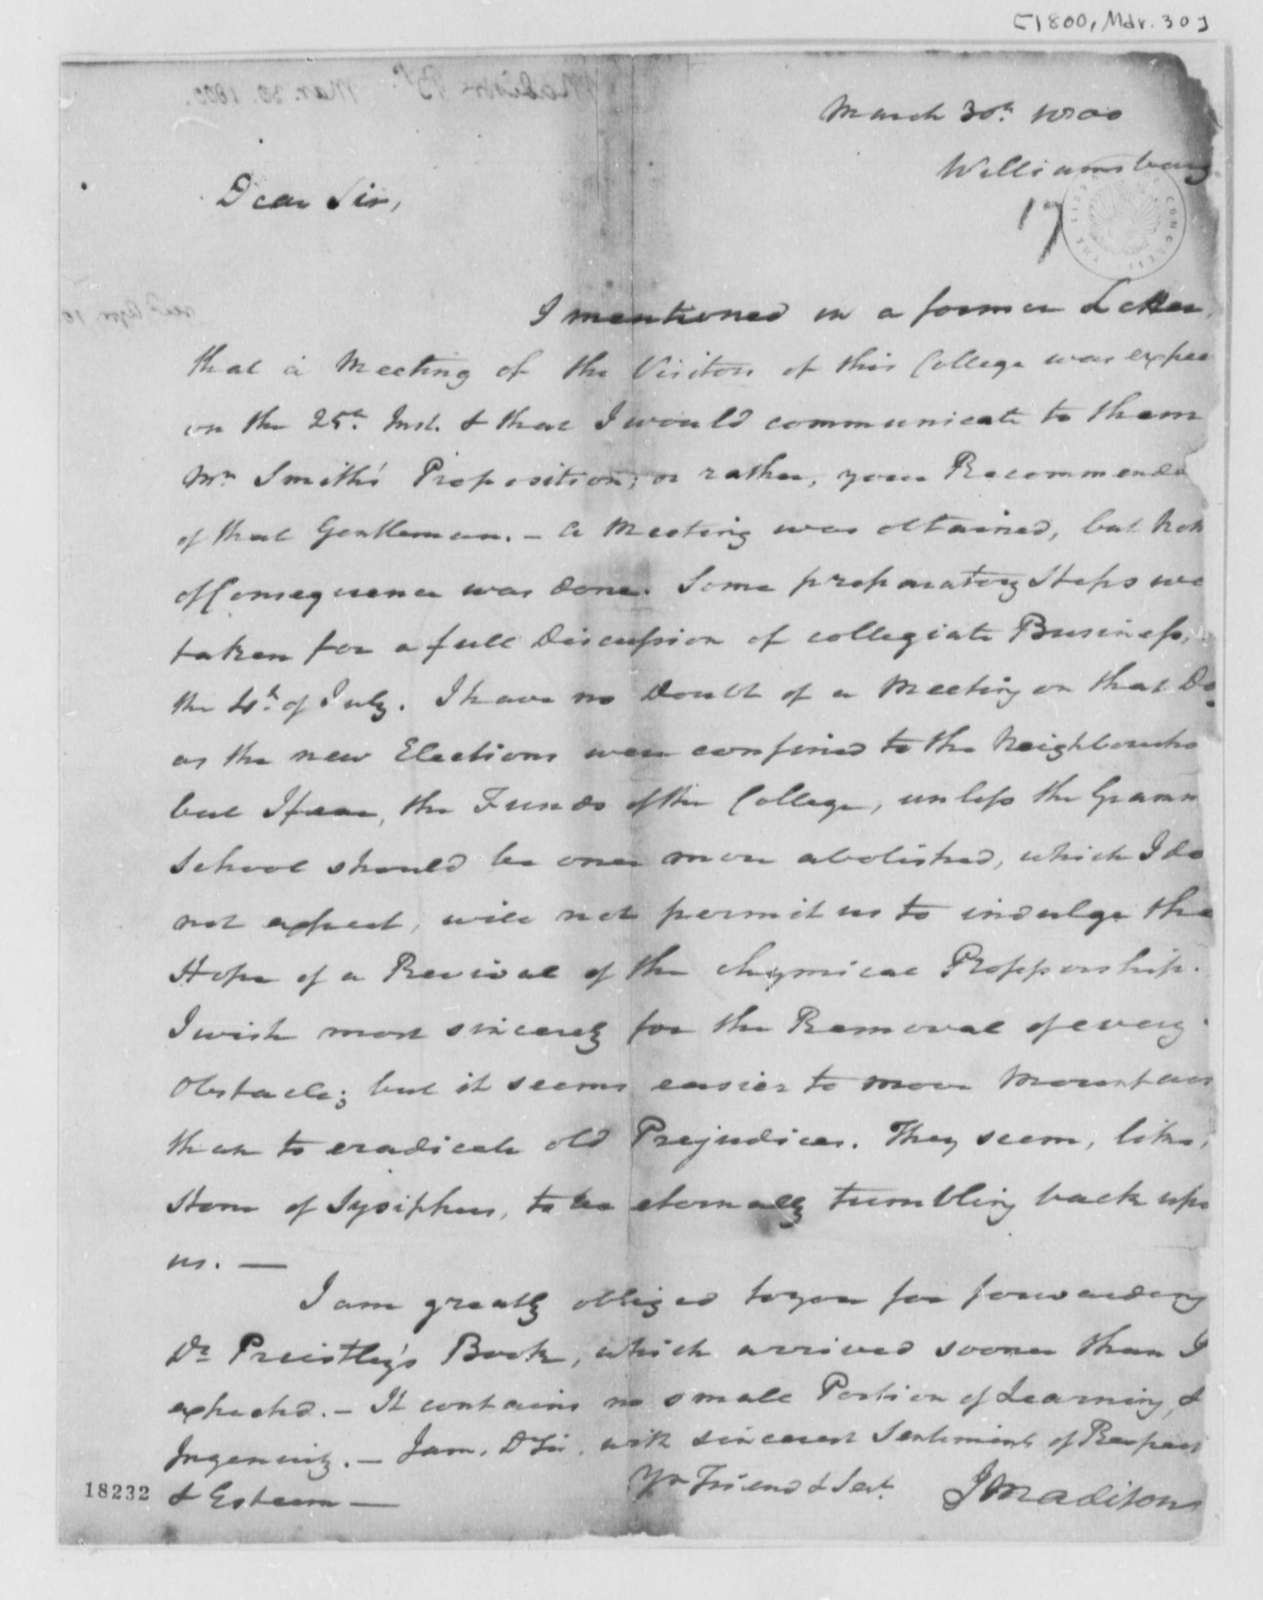 Reverend James Madison to Thomas Jefferson, March 30, 1800